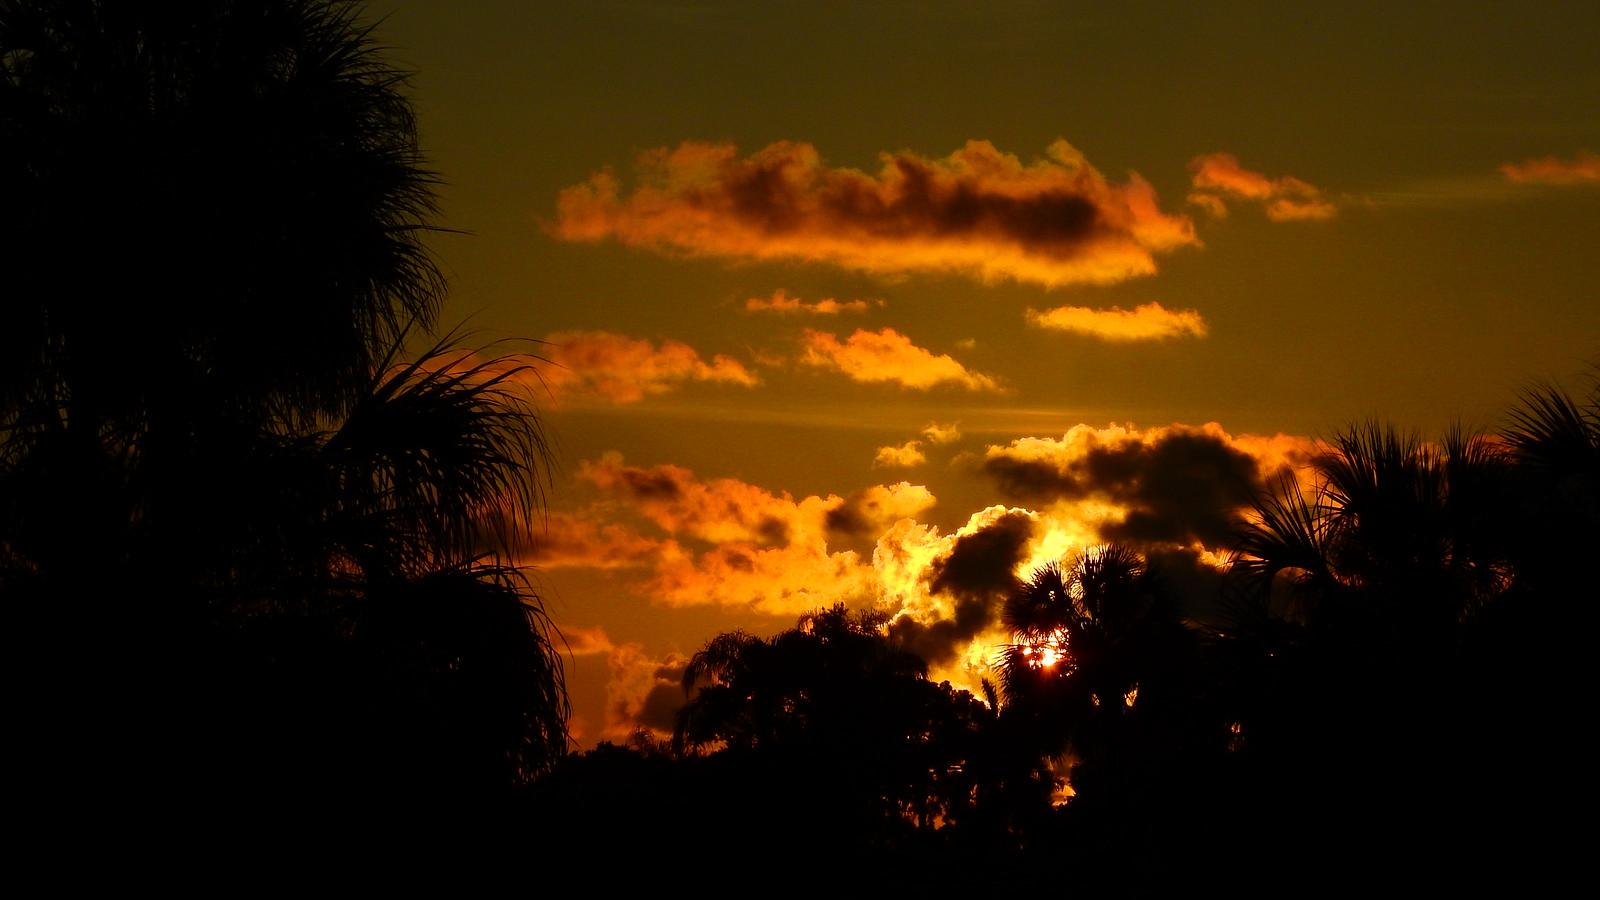 Sunset June 15th.